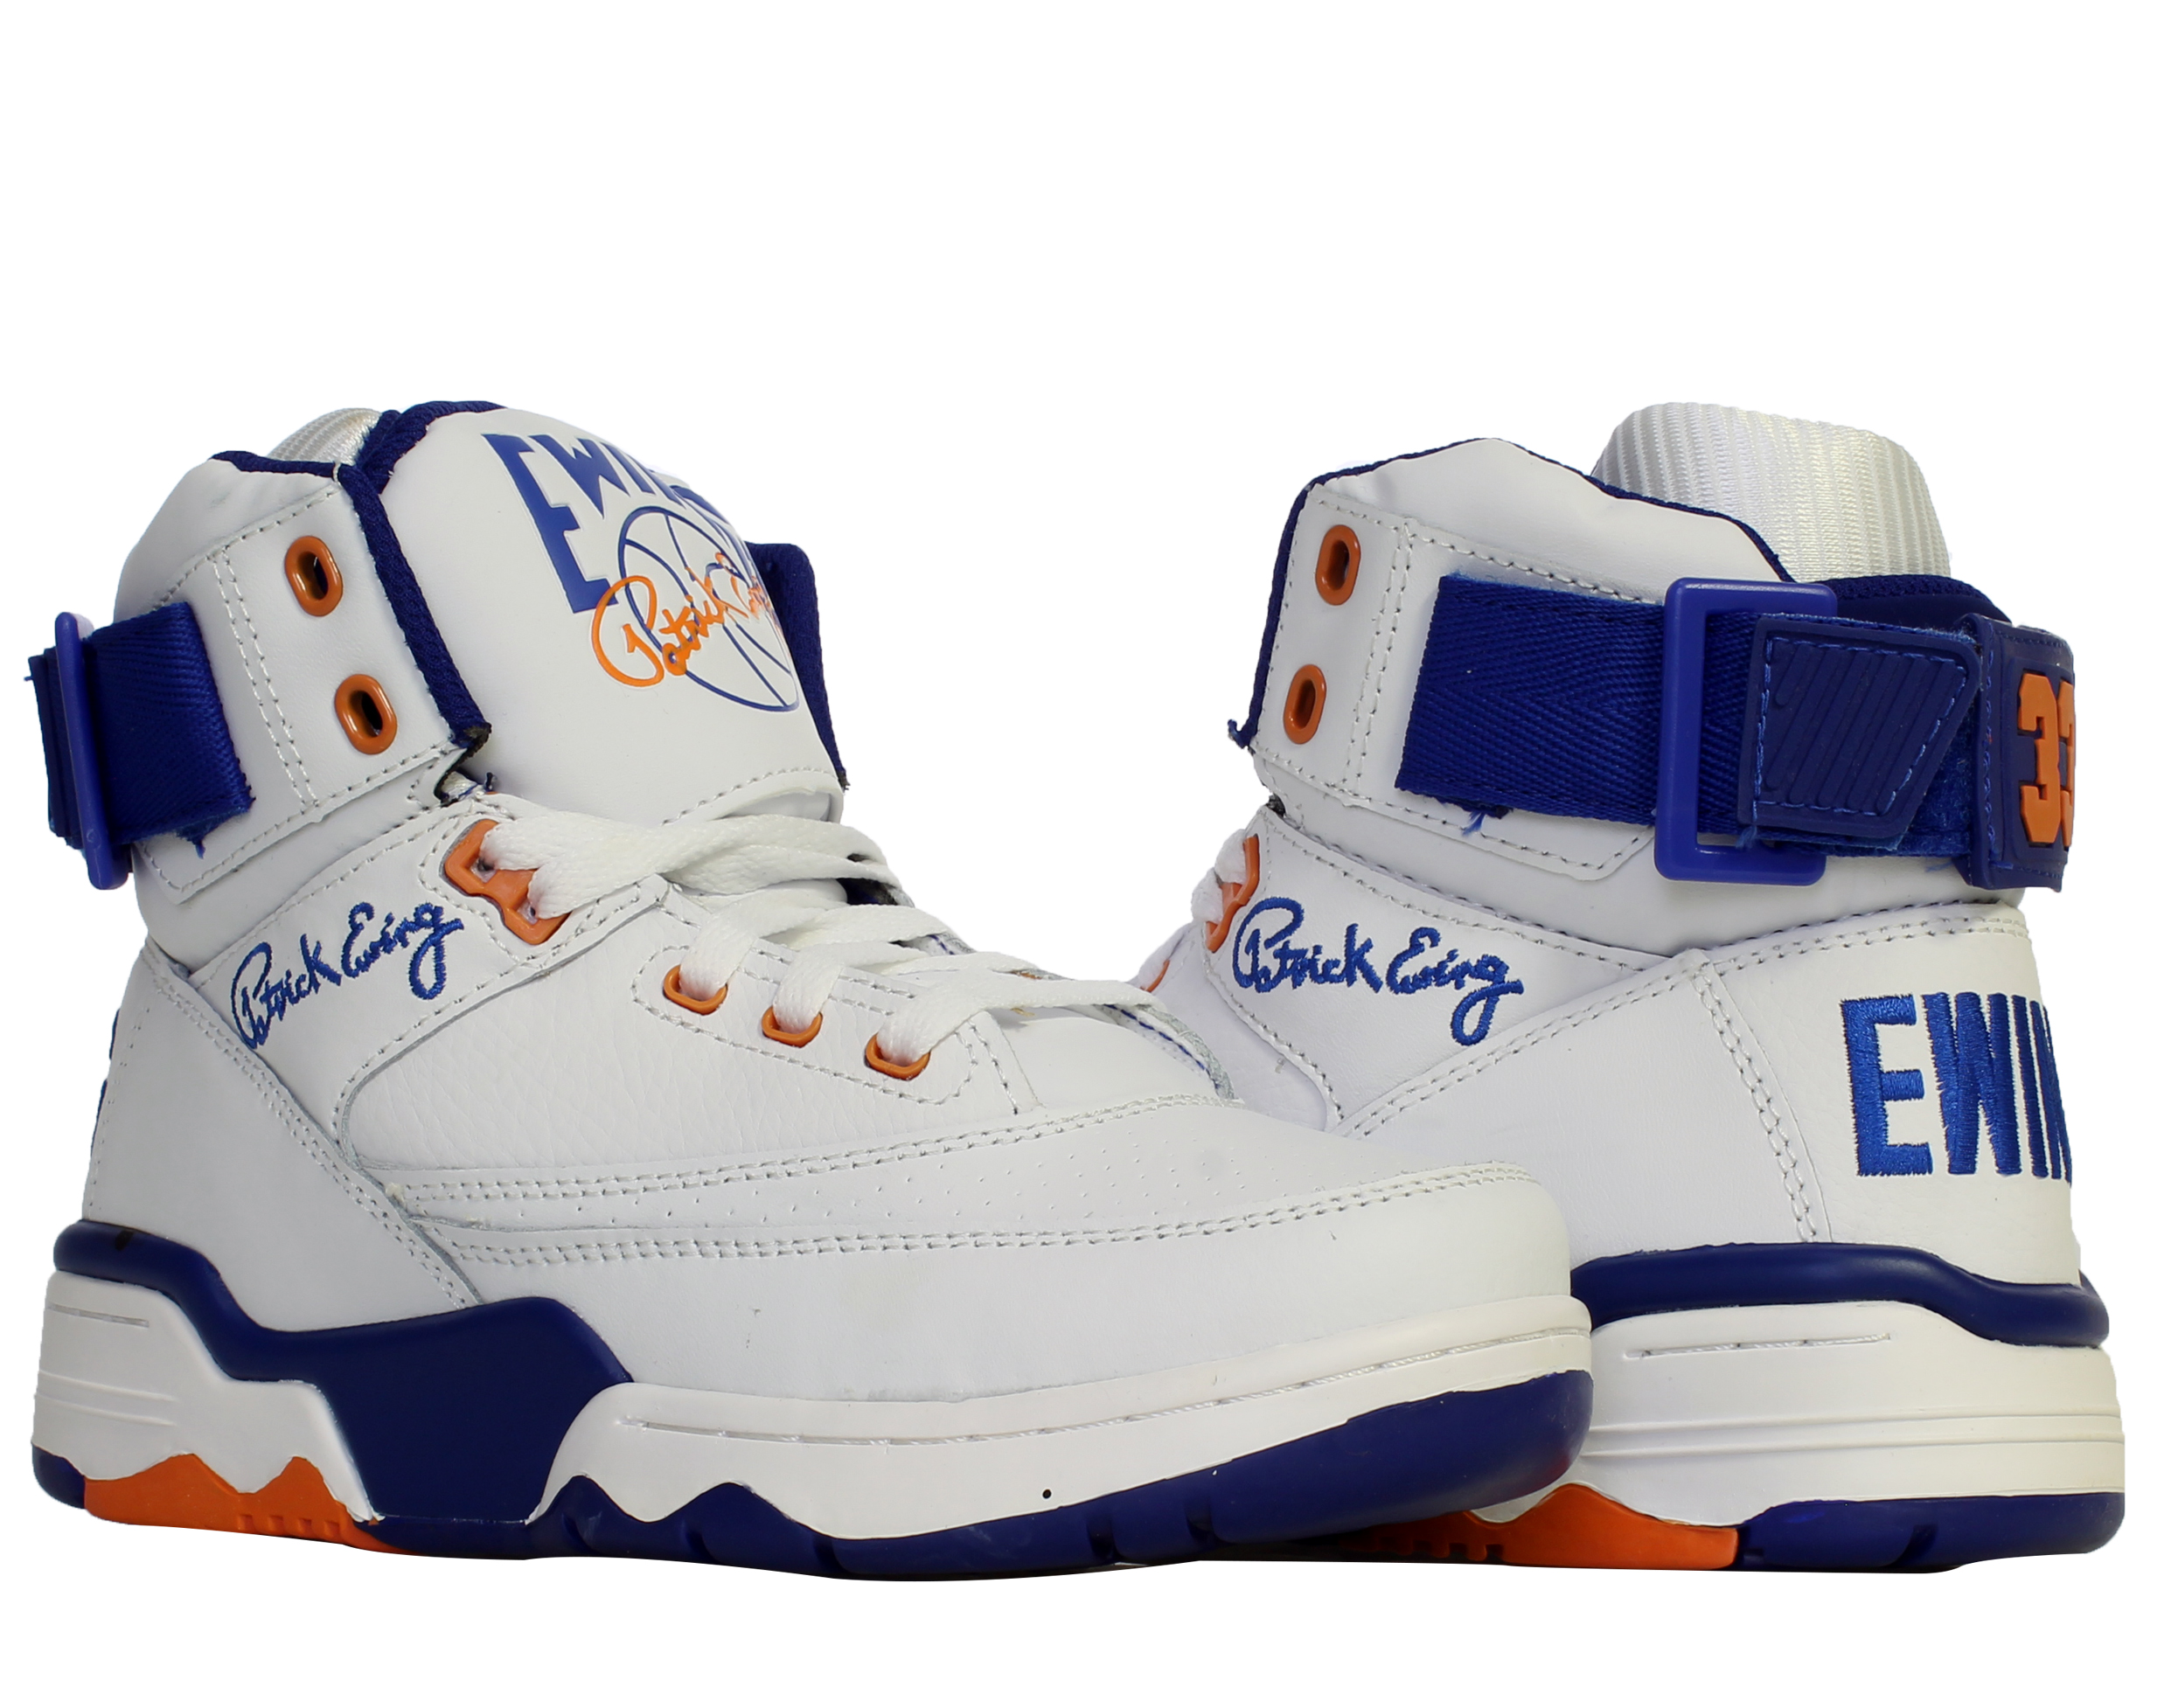 patrick ewing 33 shoes